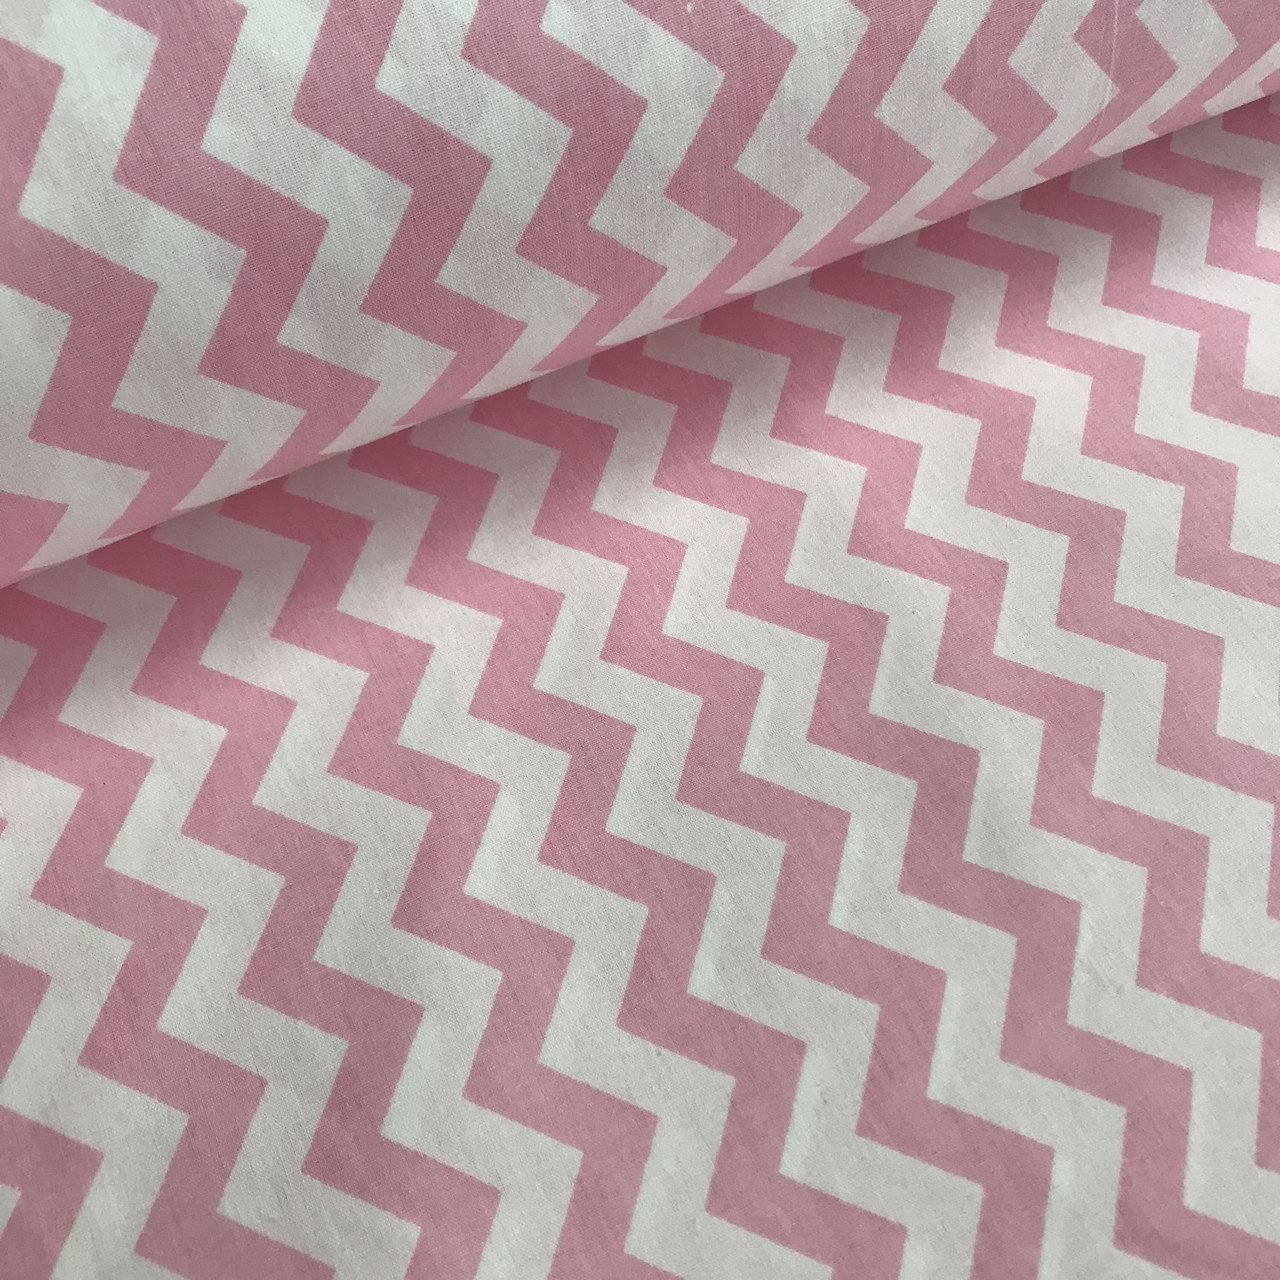 Ткань поплин зигзаг розовый на белом (ТУРЦИЯ шир. 2,4 м) № 33-20